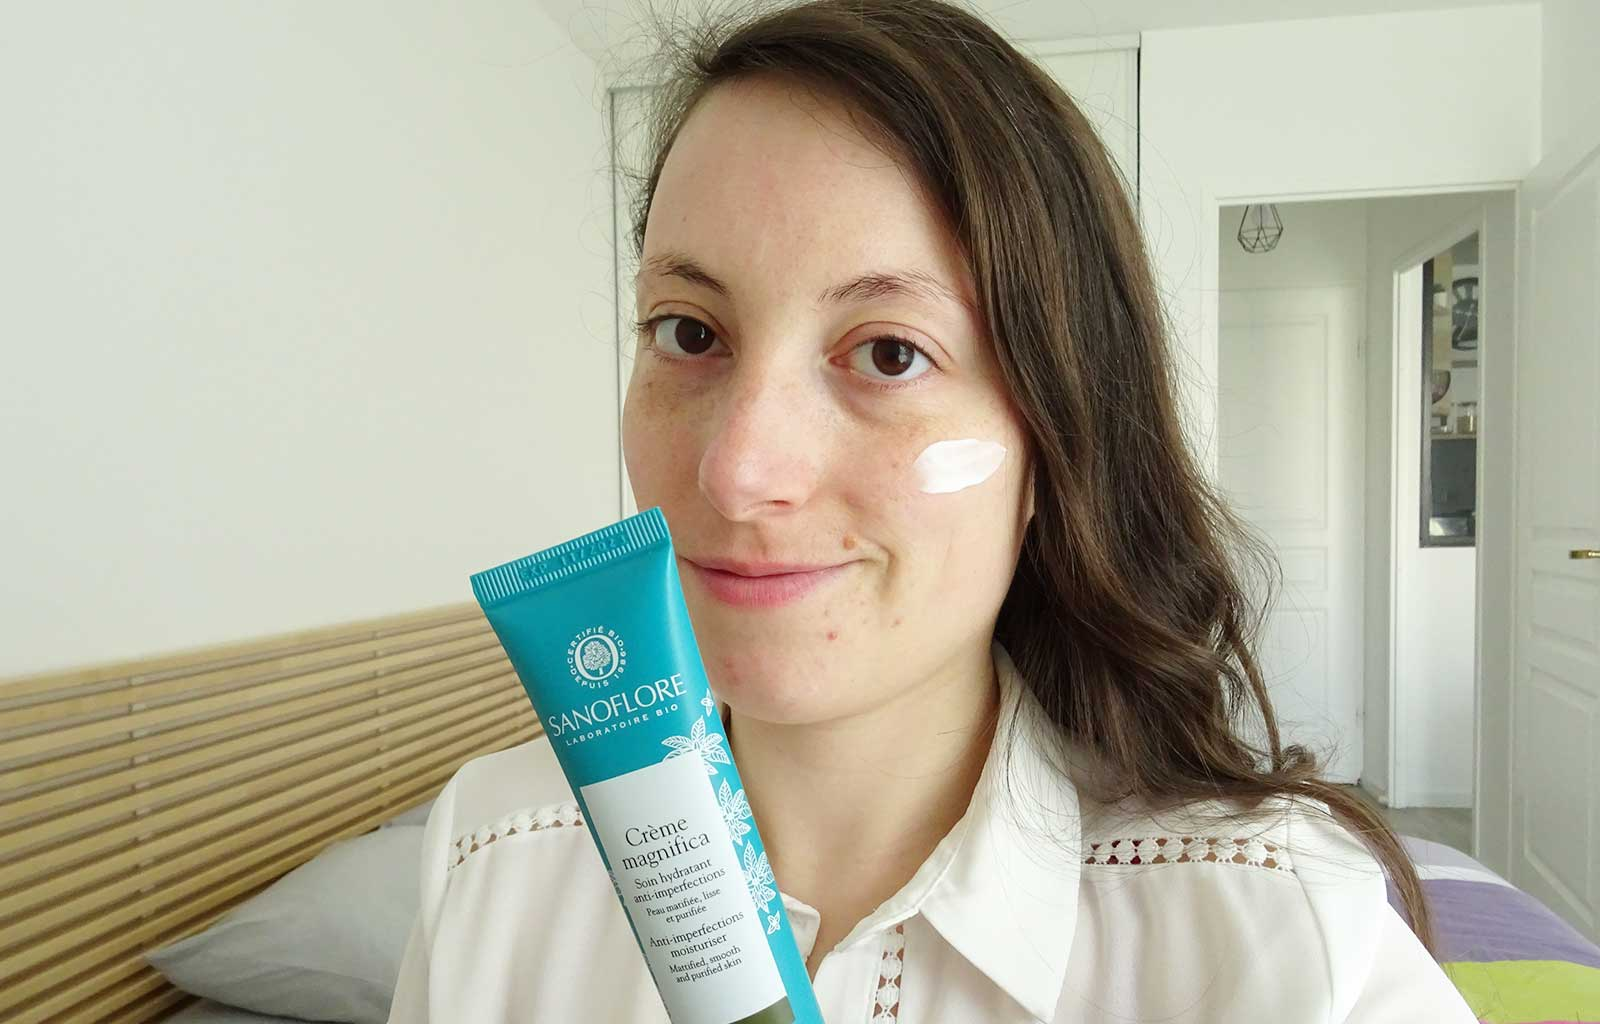 soins anti-imperfection Magnifica Sanoflore crème hydratante